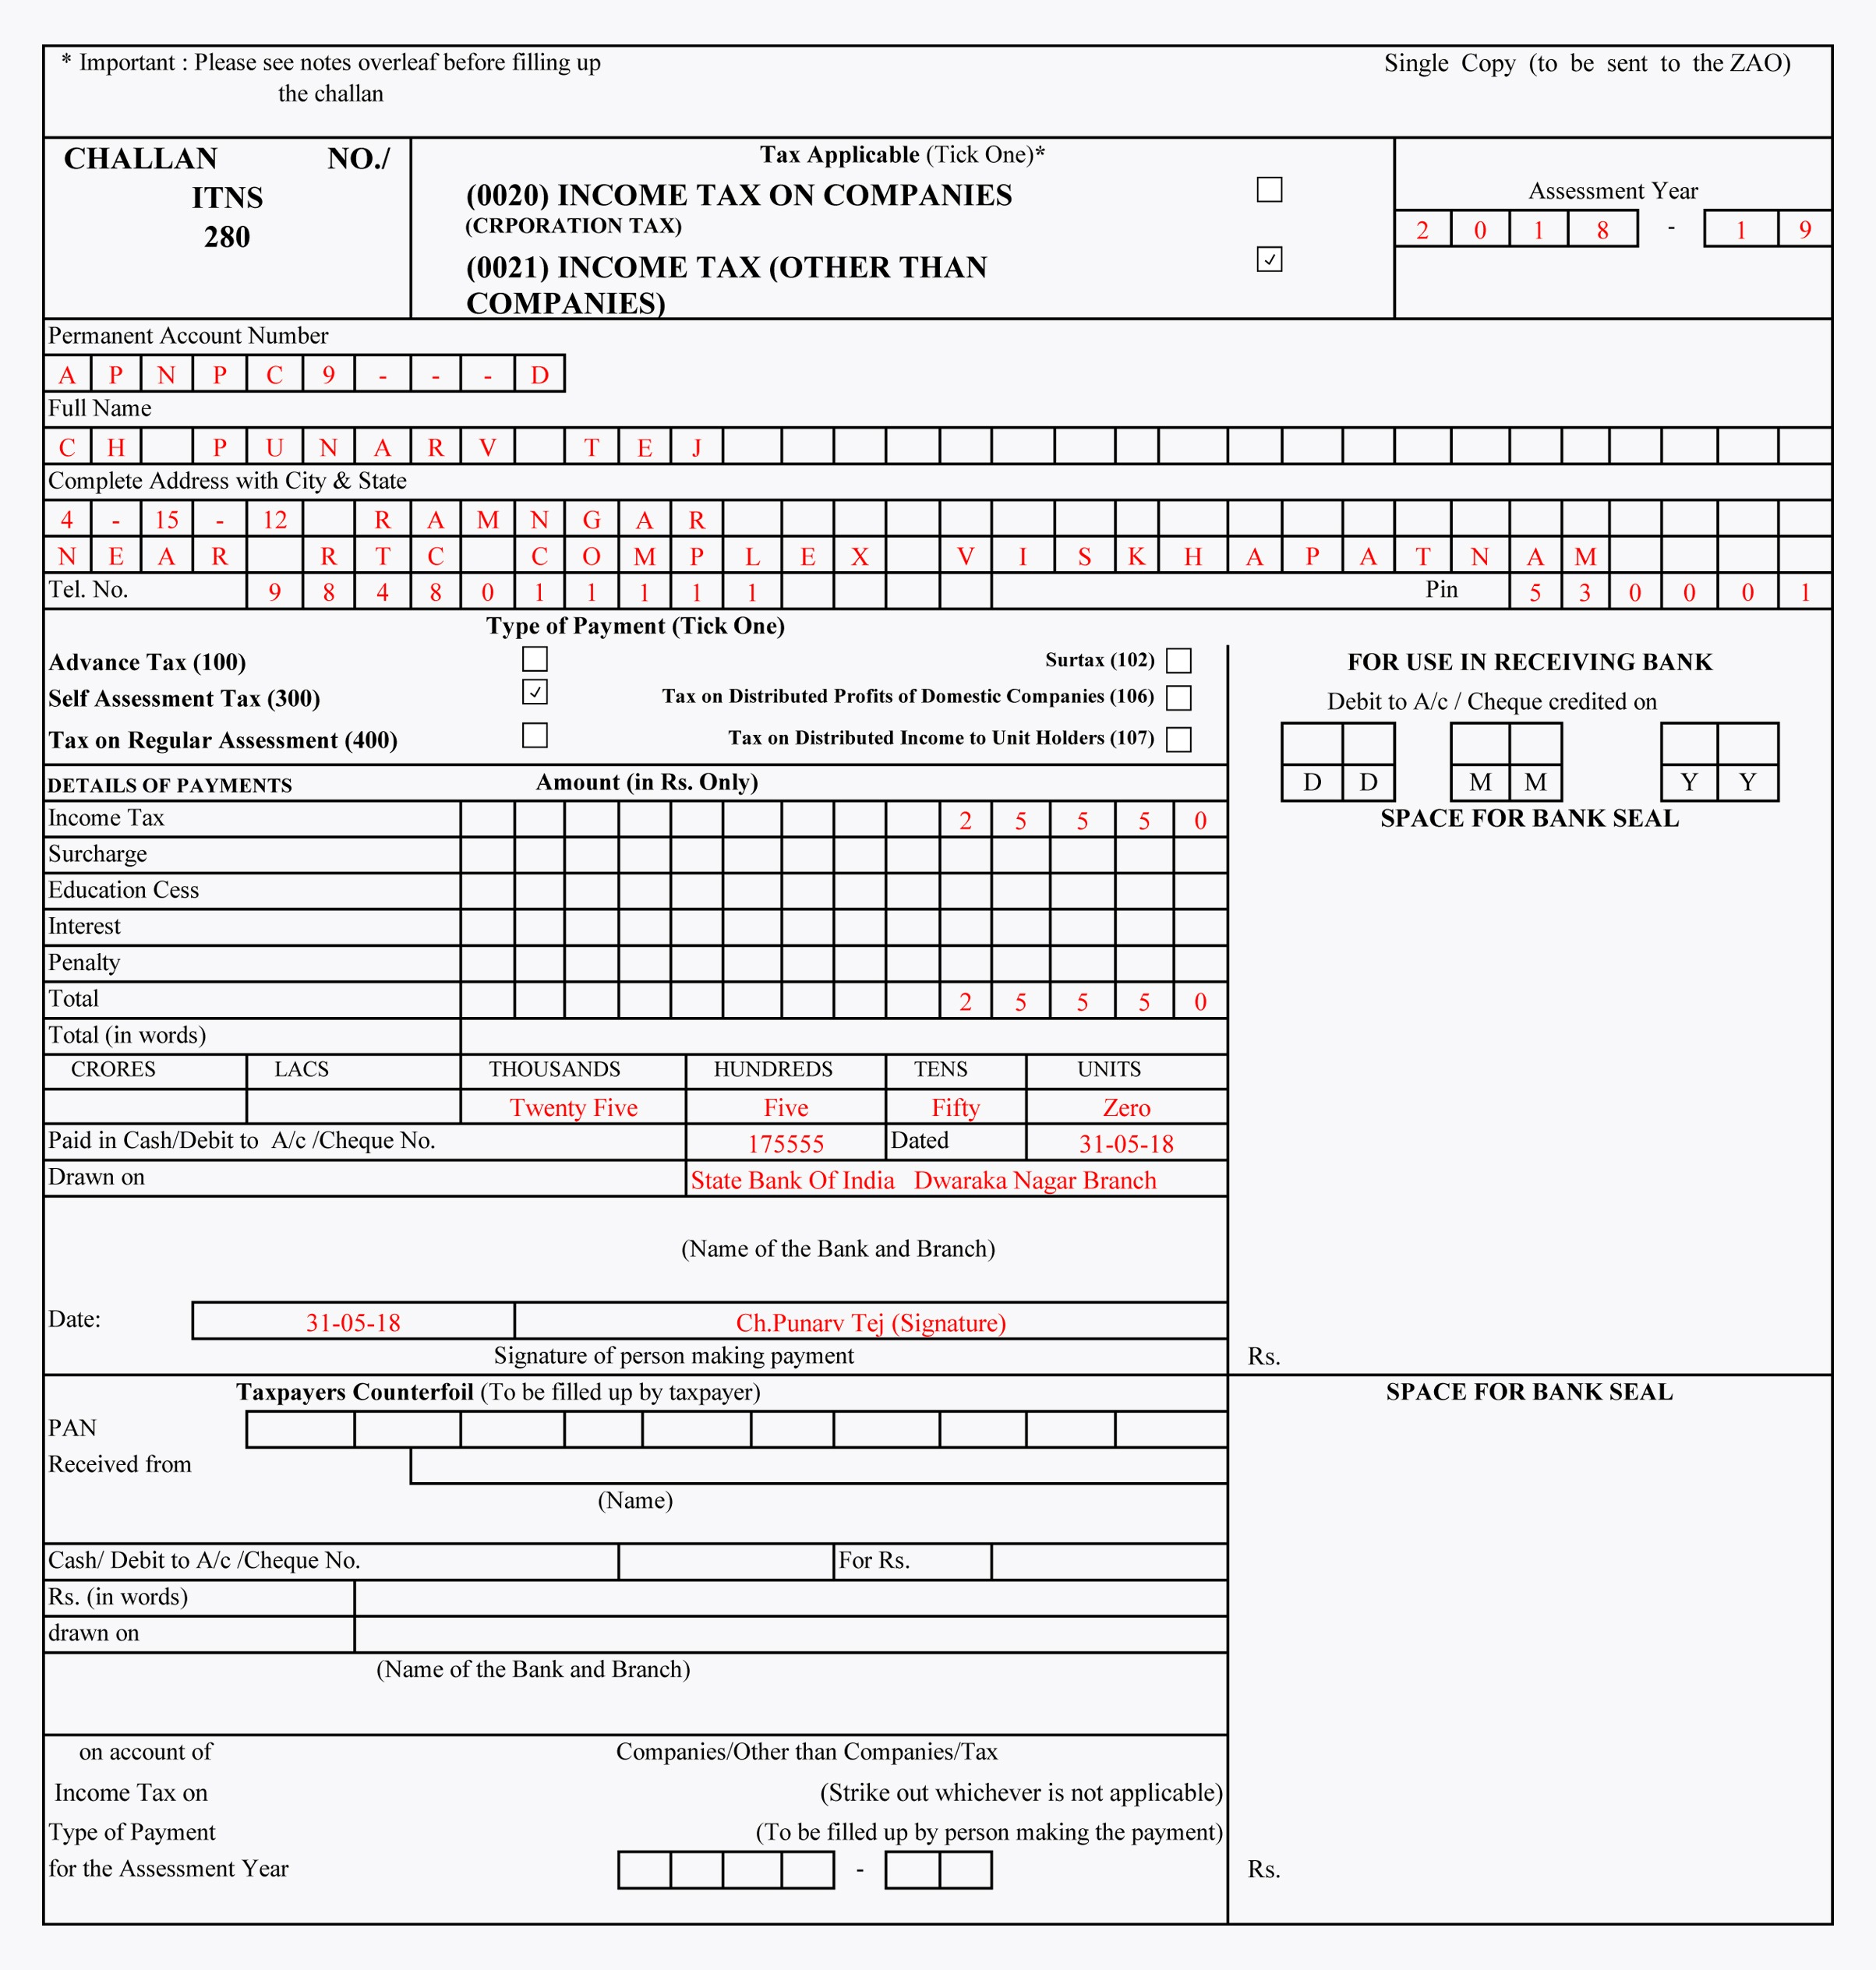 Sample Filled Challan 280 | TDS Challan 280 Excel Format